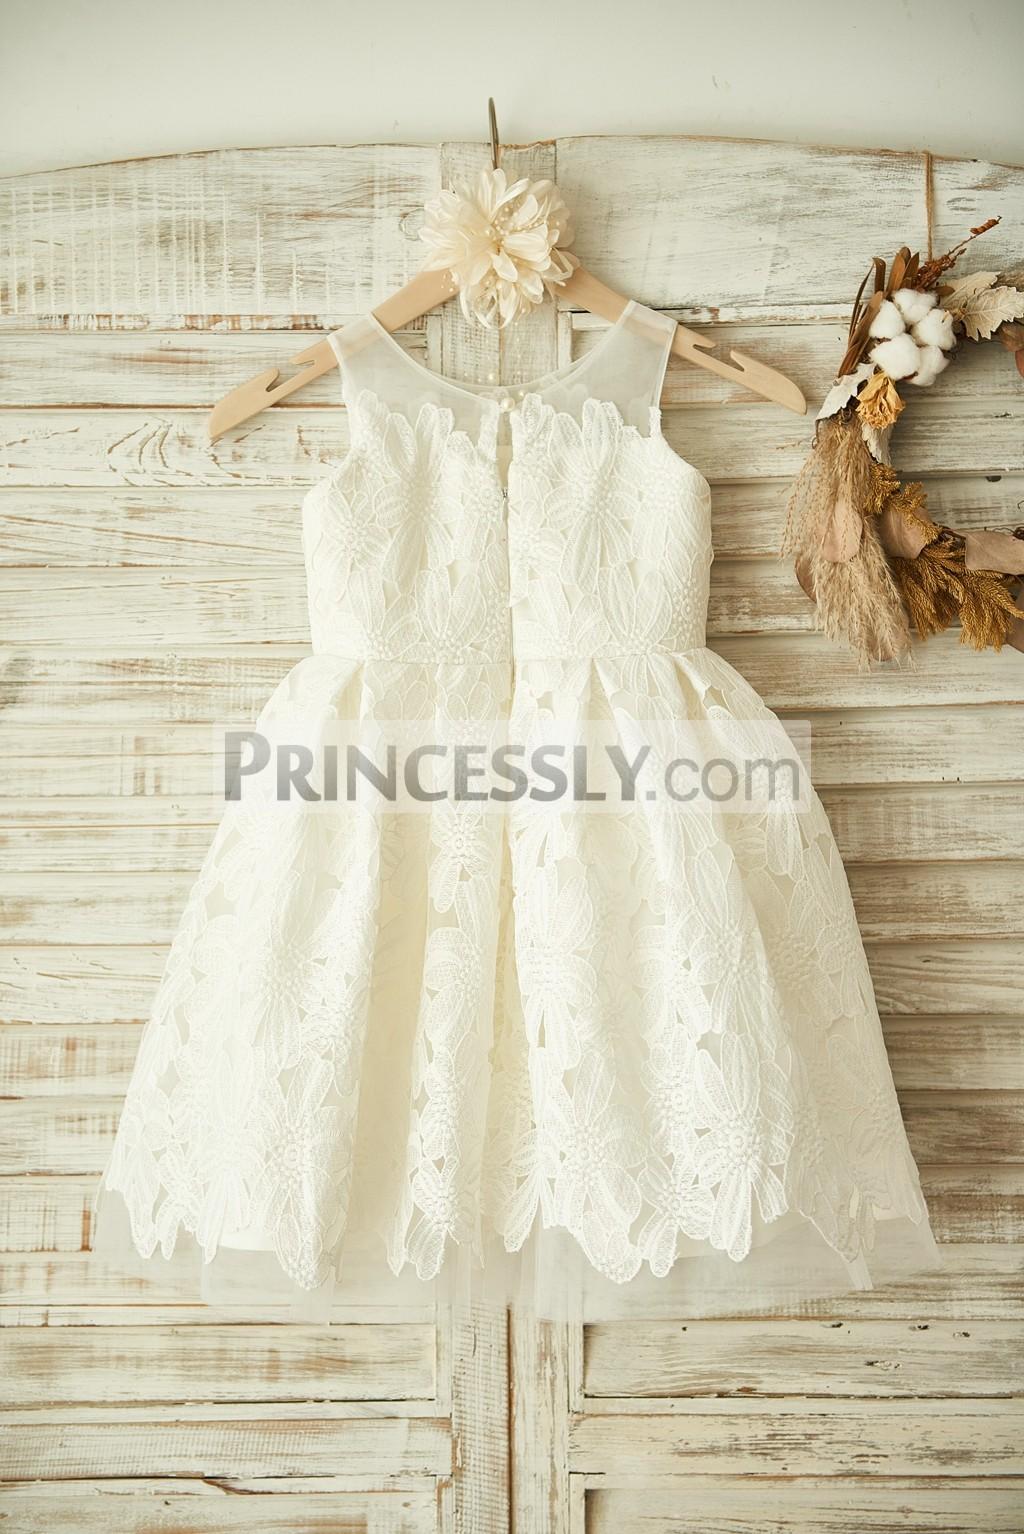 princessly-com-k1003358-ivory-lace-tulle-wedding-flower-girl-dress-with-sheer-neck-32